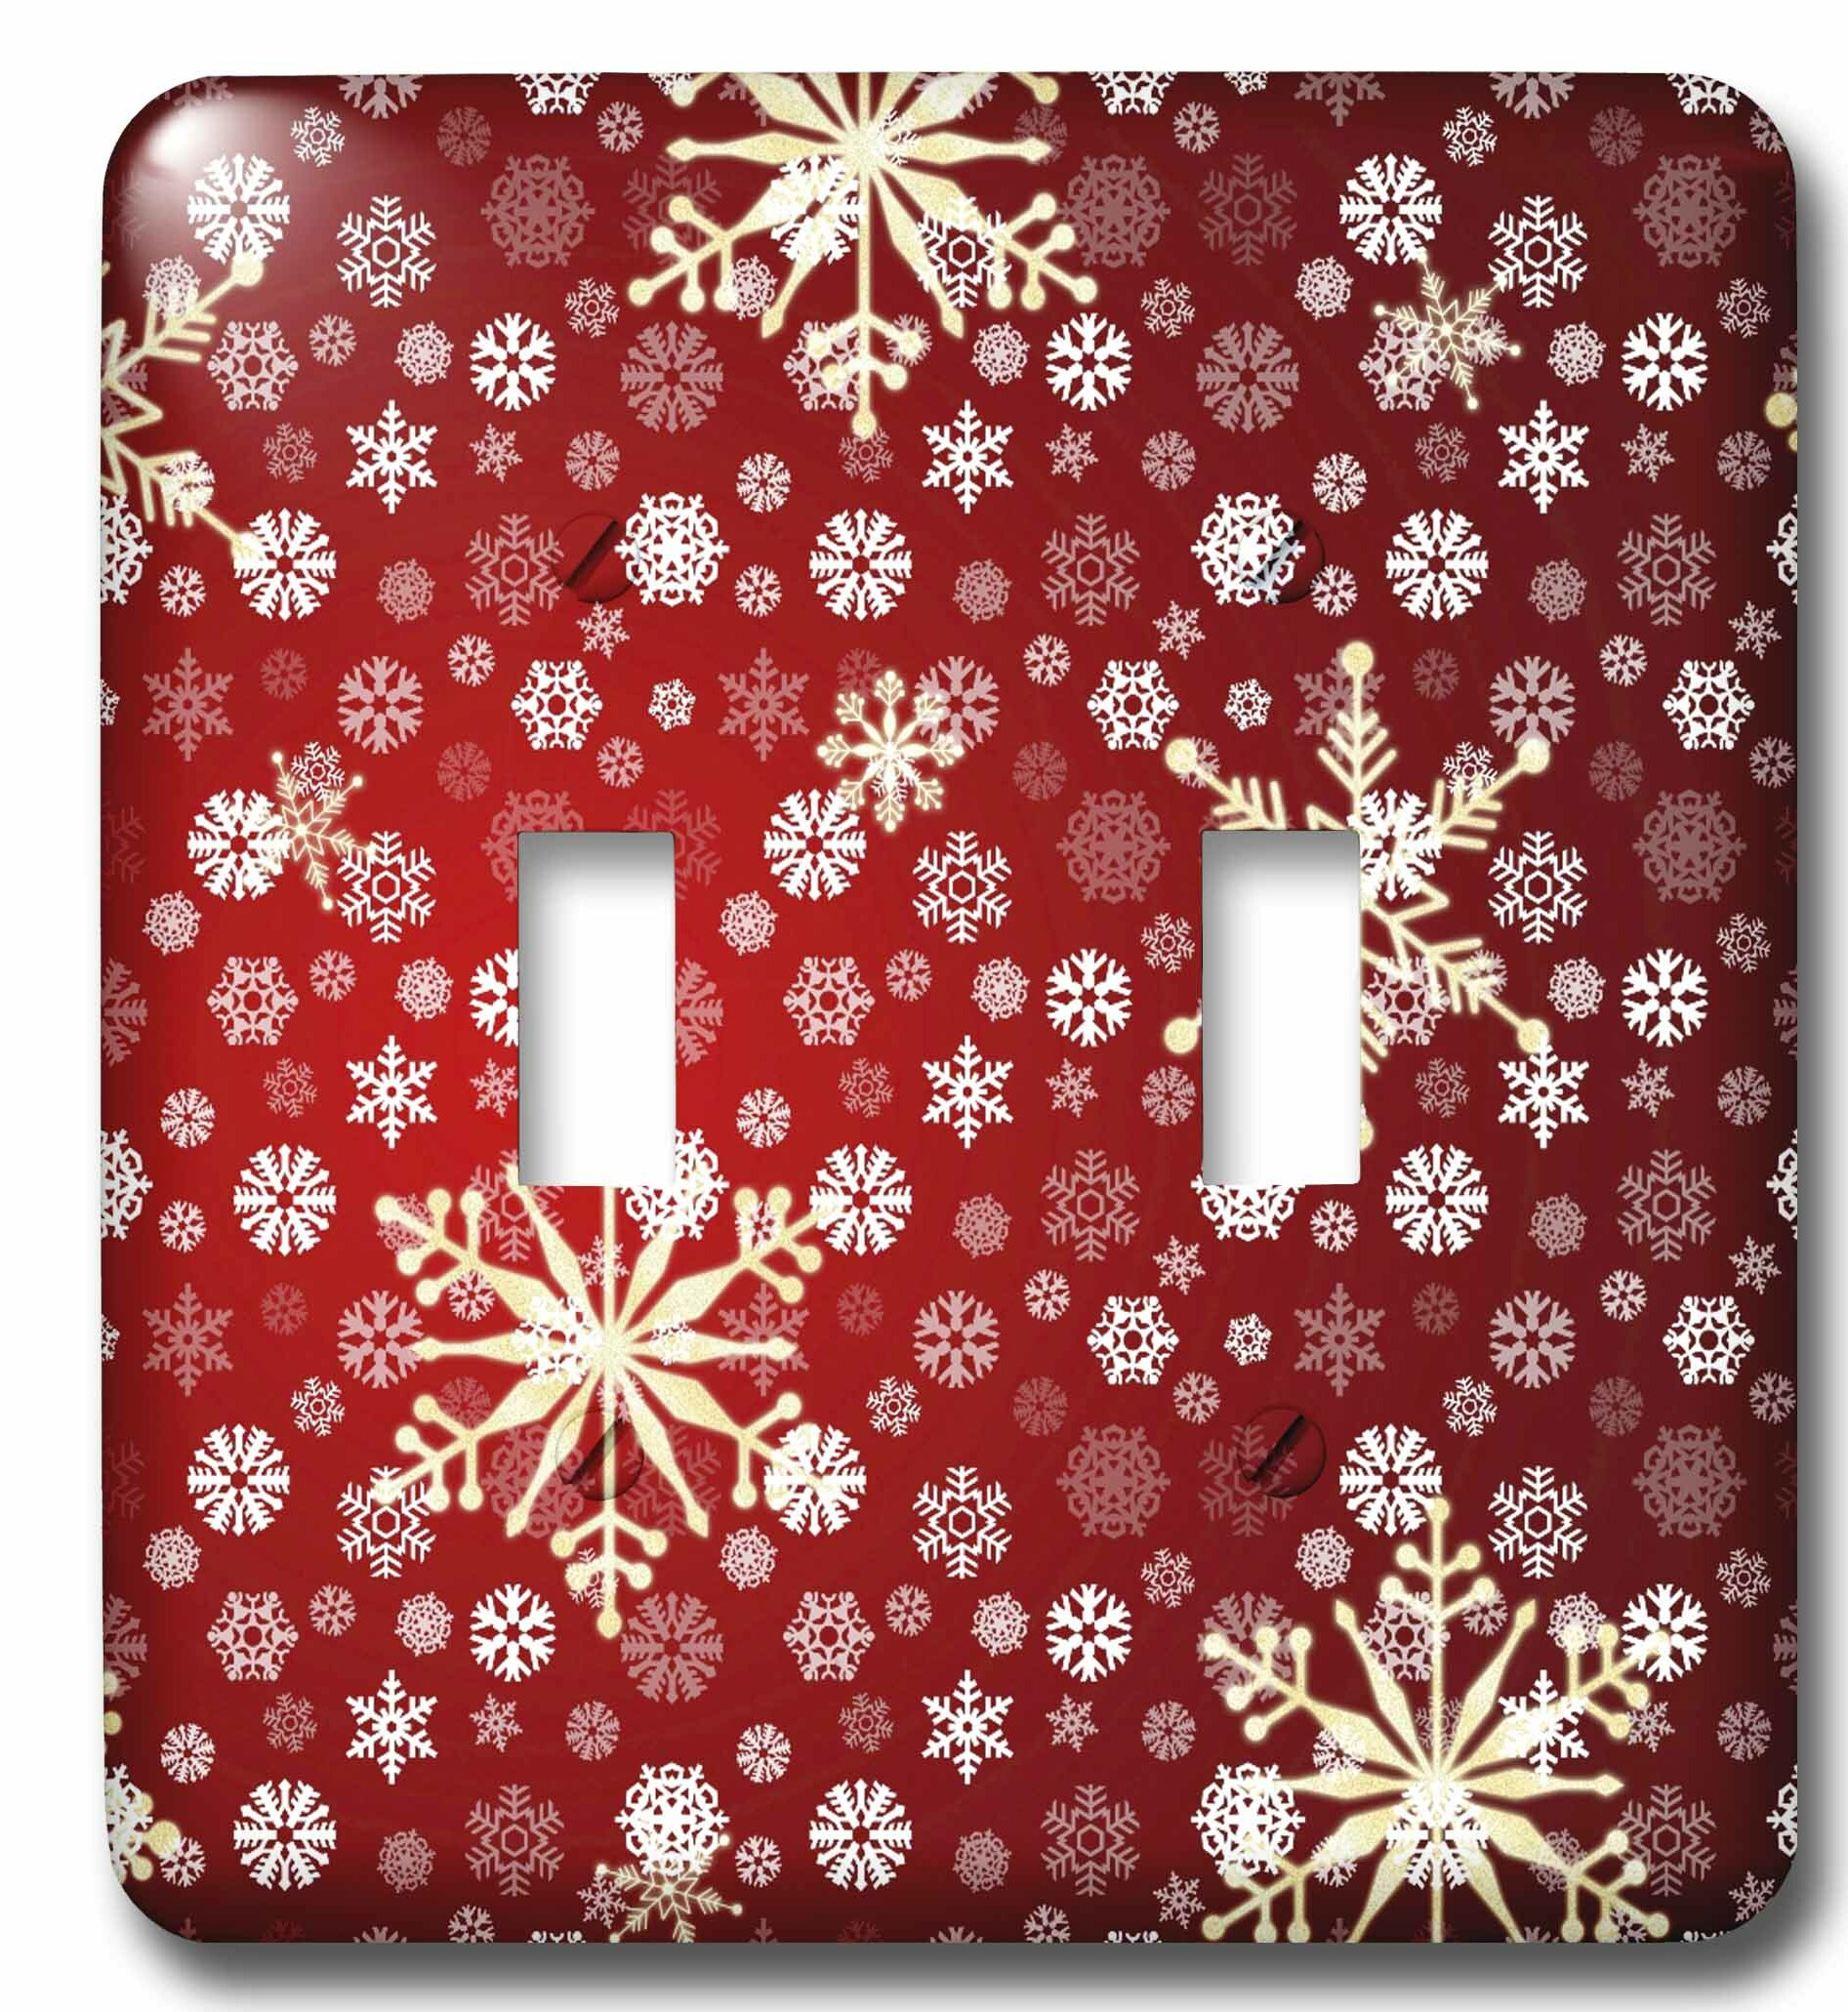 3drose Christmas Snowflakes 2 Gang Toggle Light Switch Wall Plate Wayfair